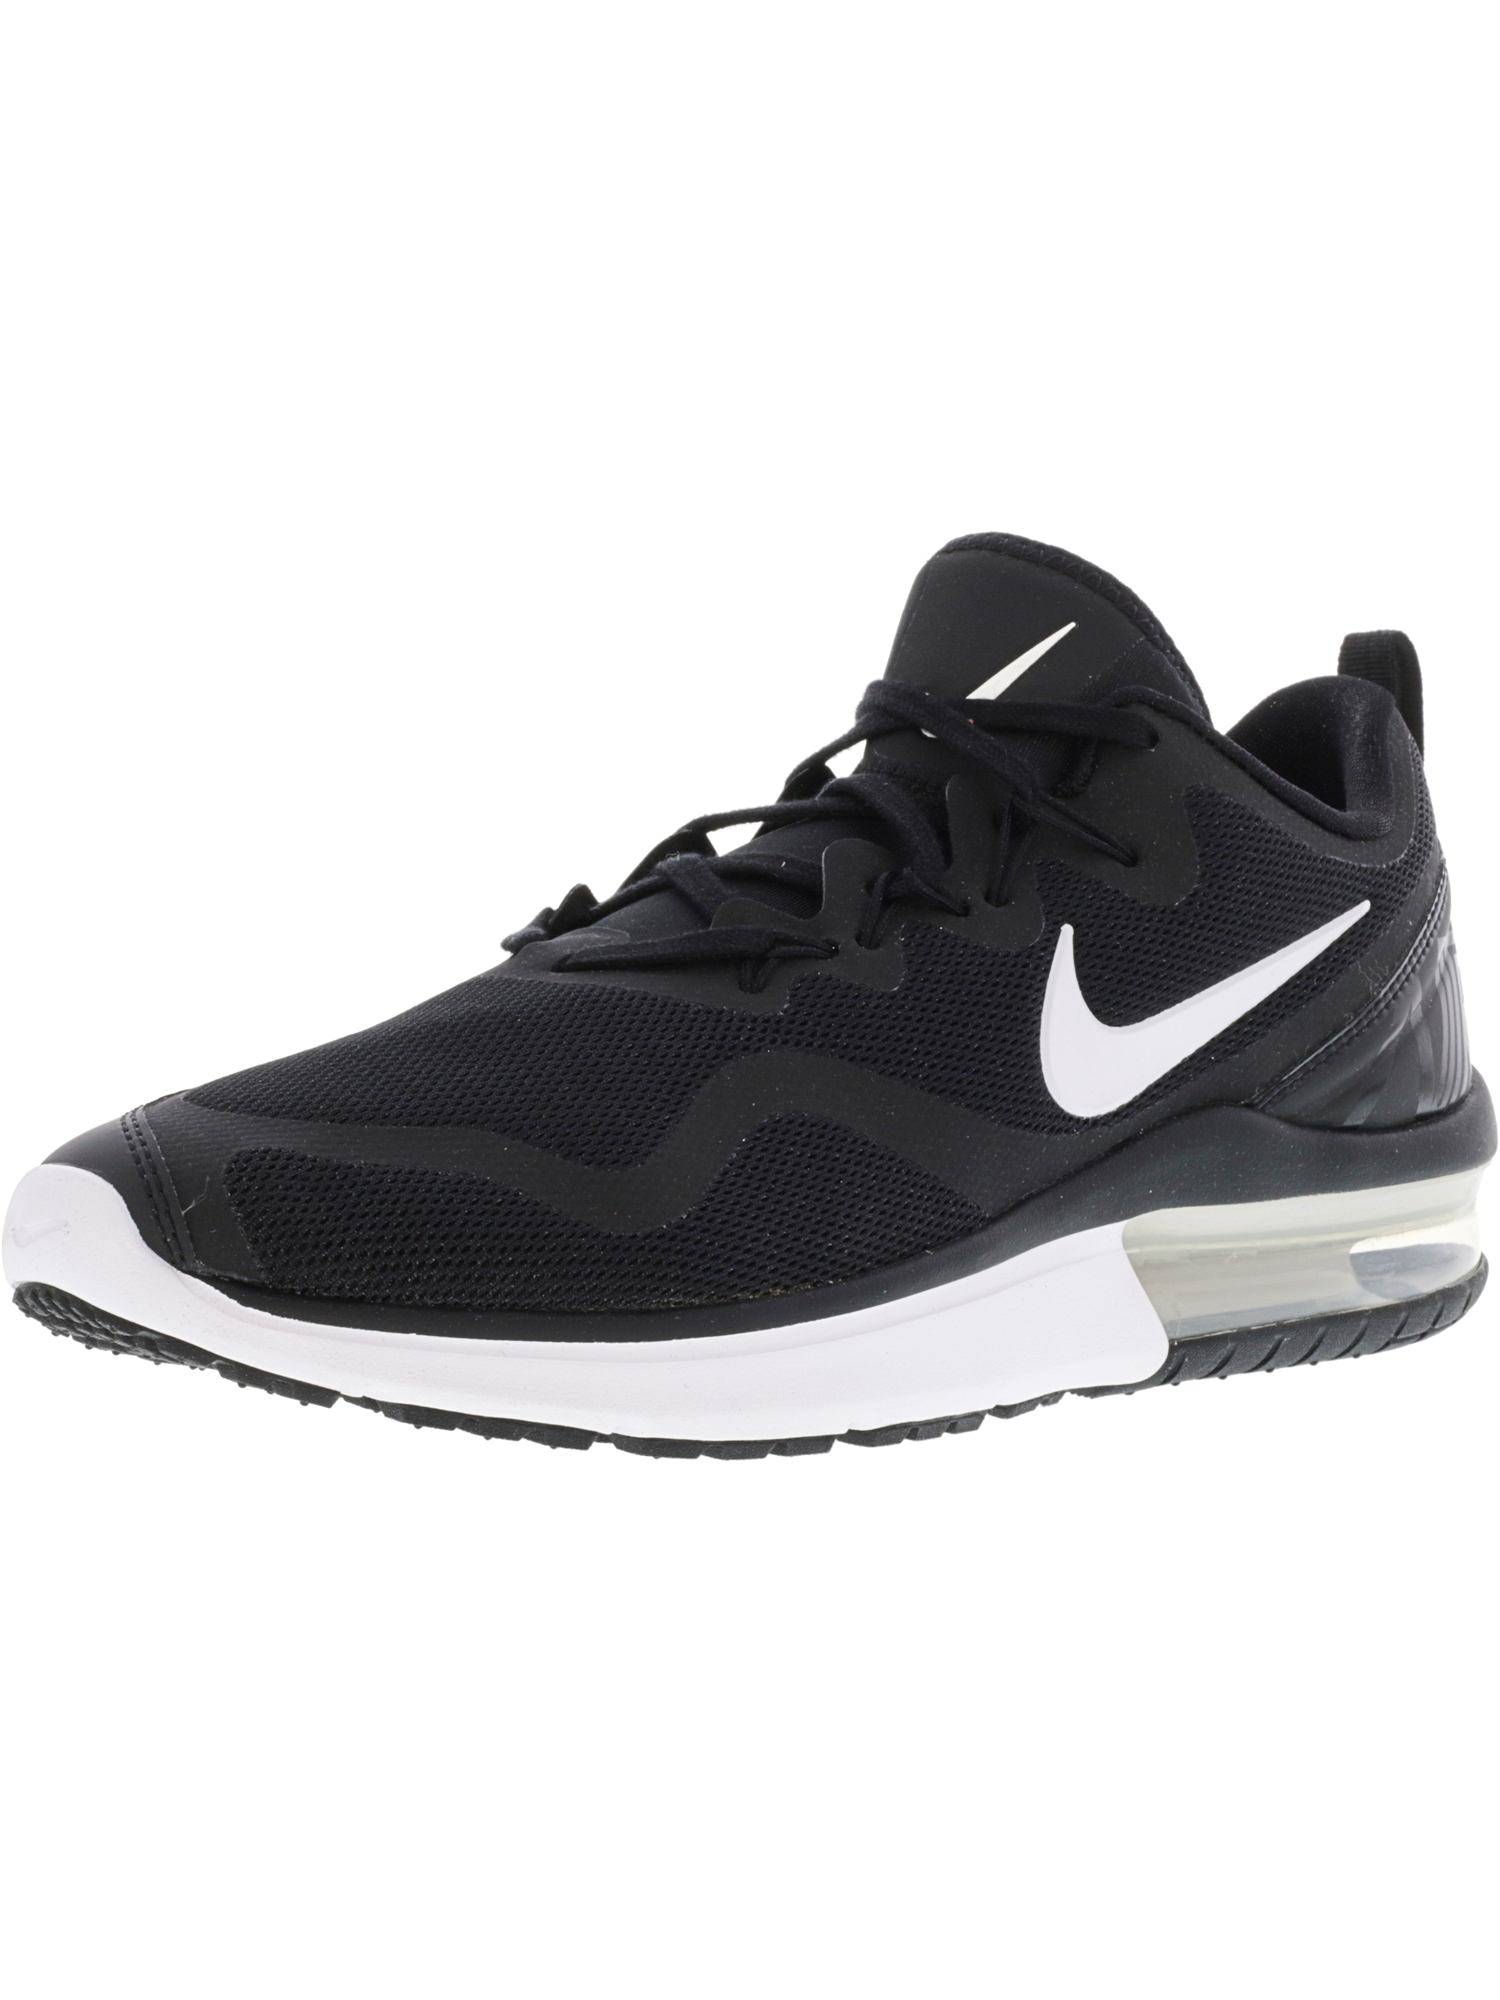 Nike Women's Air Max Fury Black / White-Black Low Top Cross Trainer Shoe - 9.5M